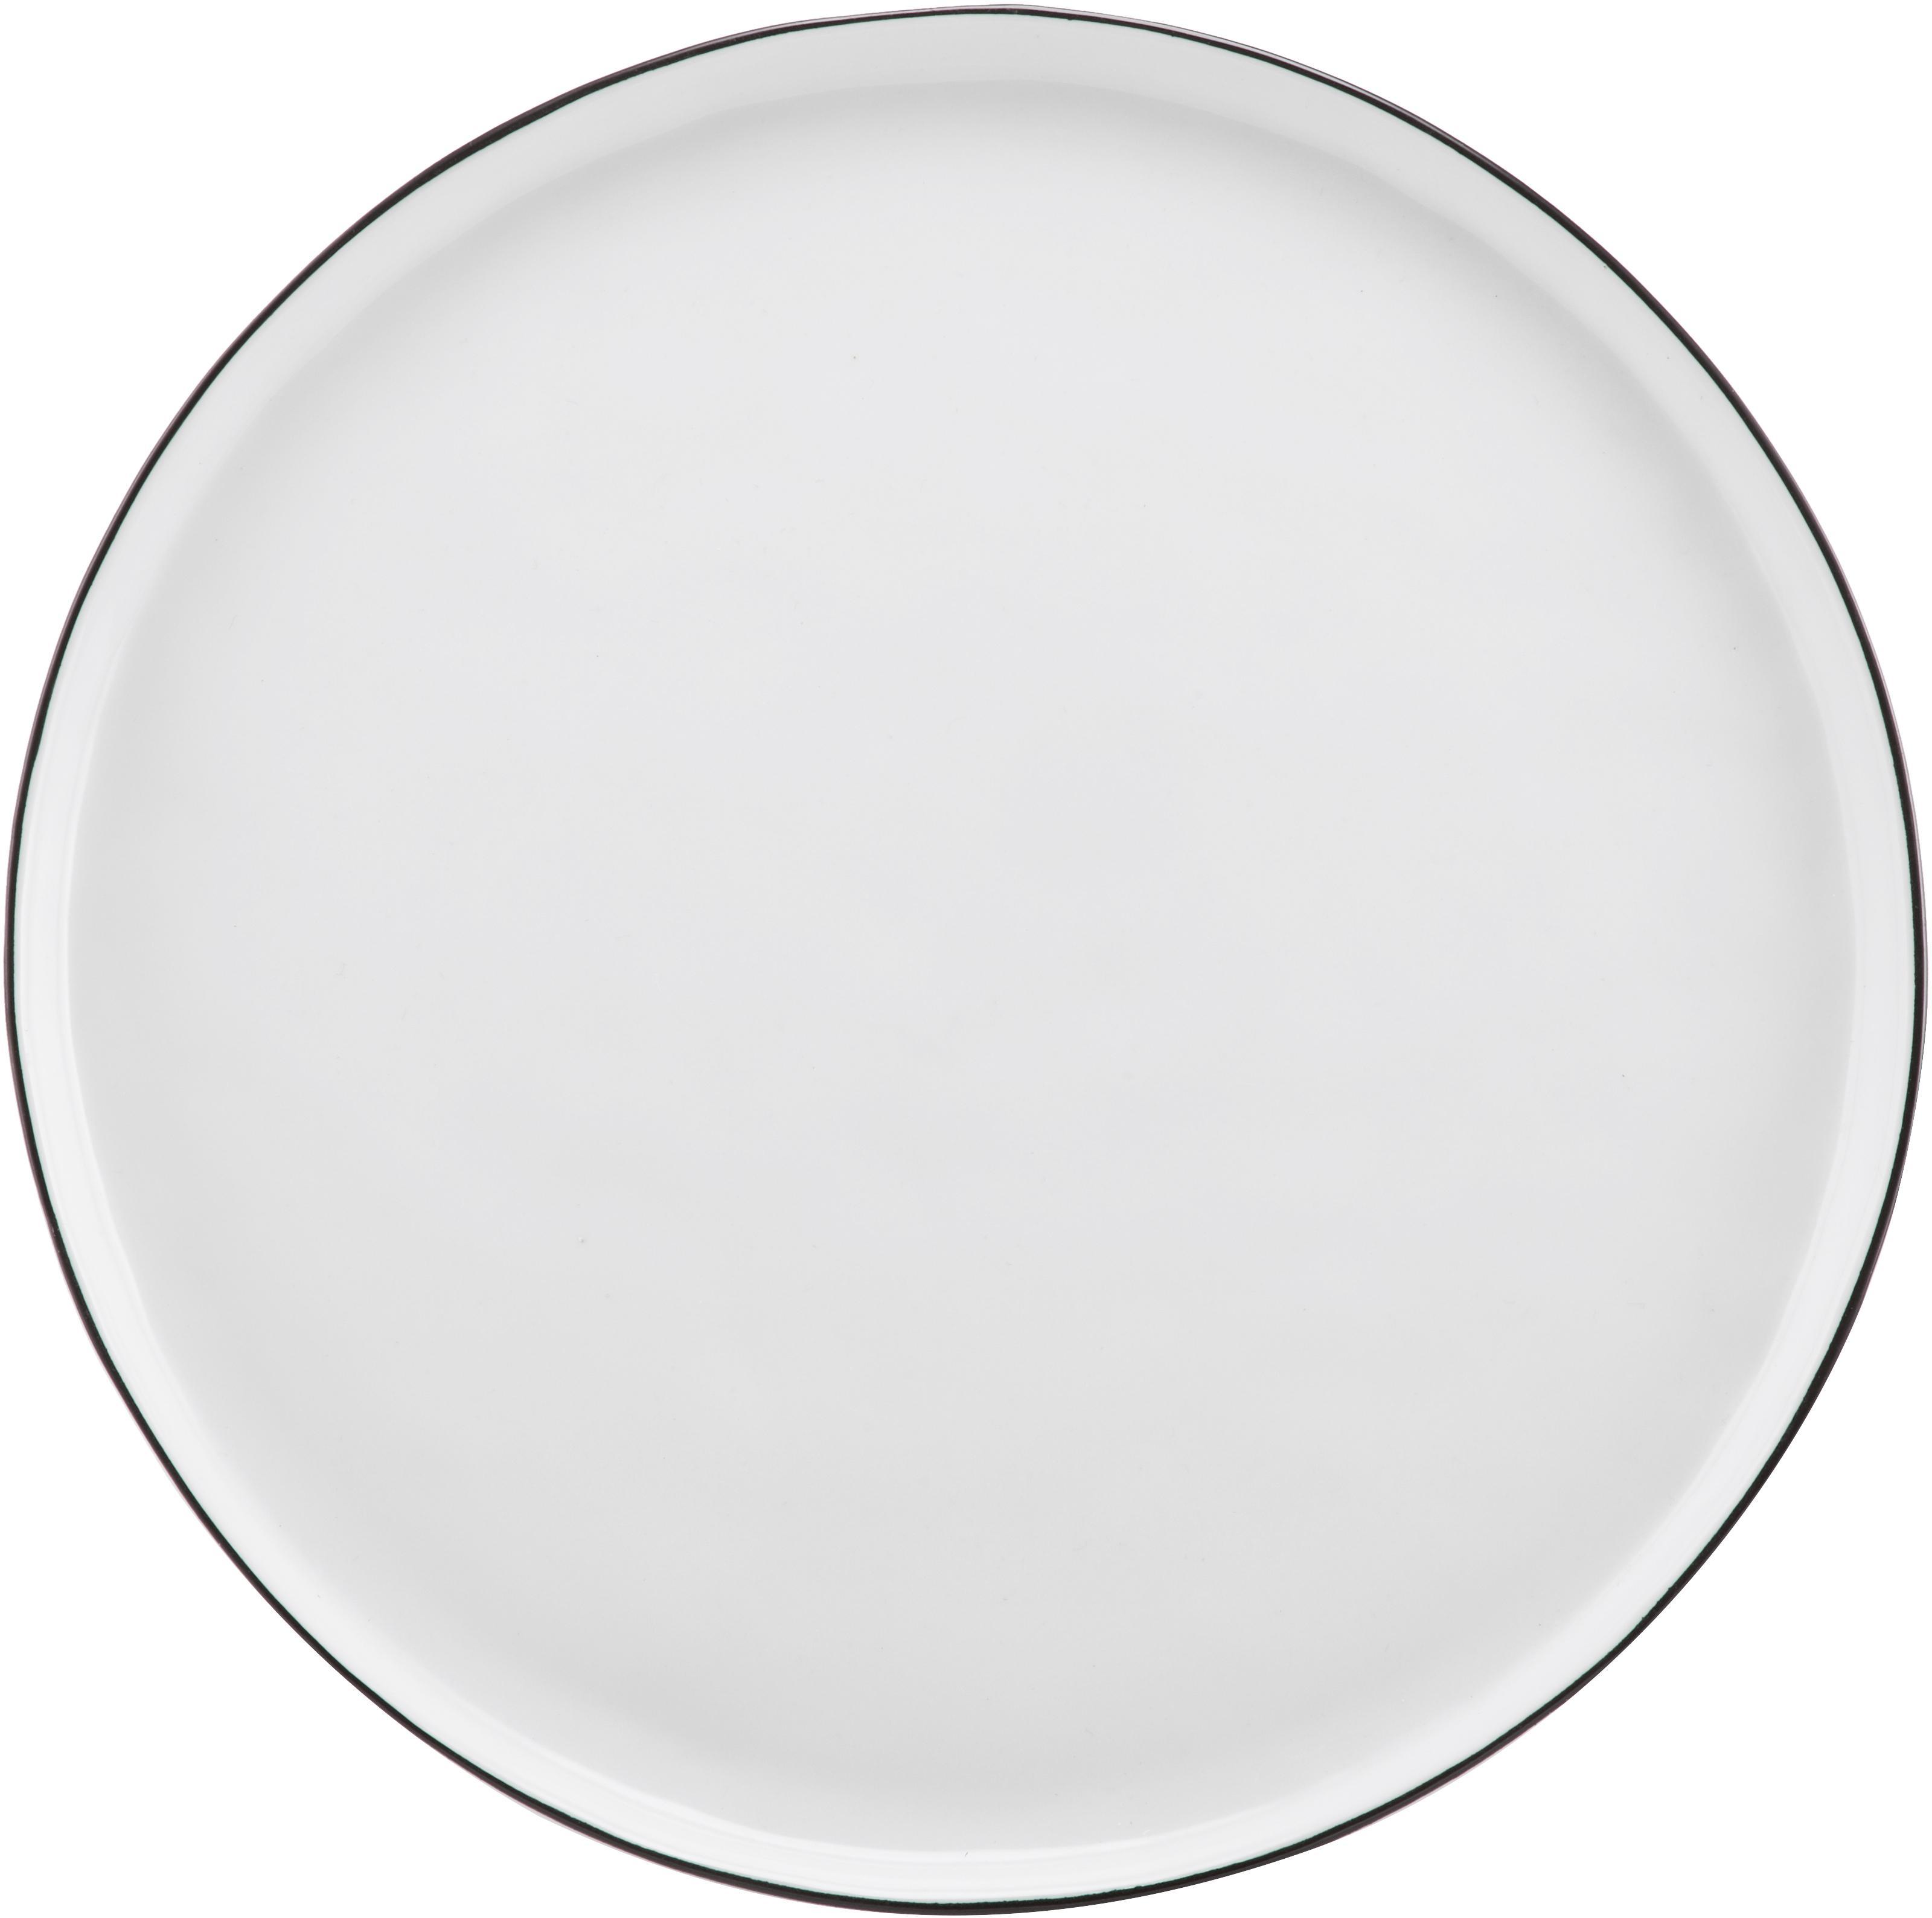 Vajilla artesanal Salt, 4comensales (12pzas.), Porcelana, Blanco crudo, negro, Tamaños diferentes